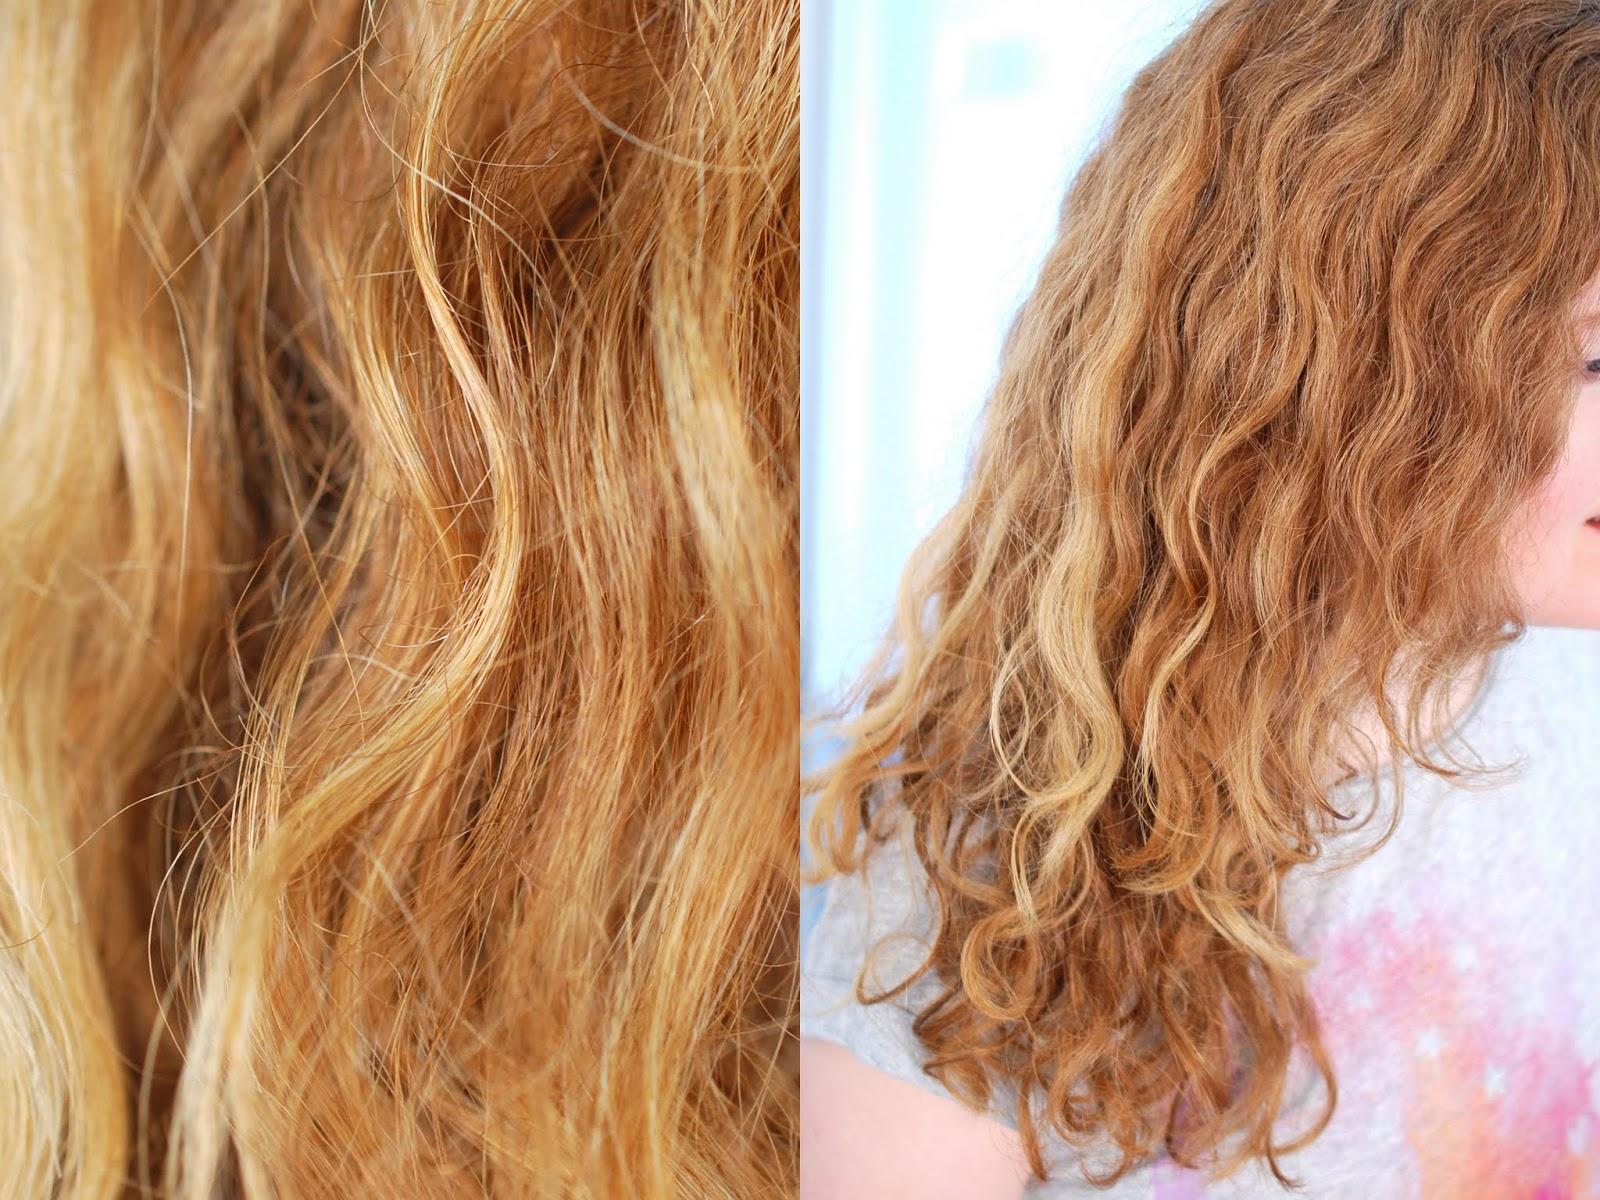 Das chinesische Shampoo gegen den Haarausfall